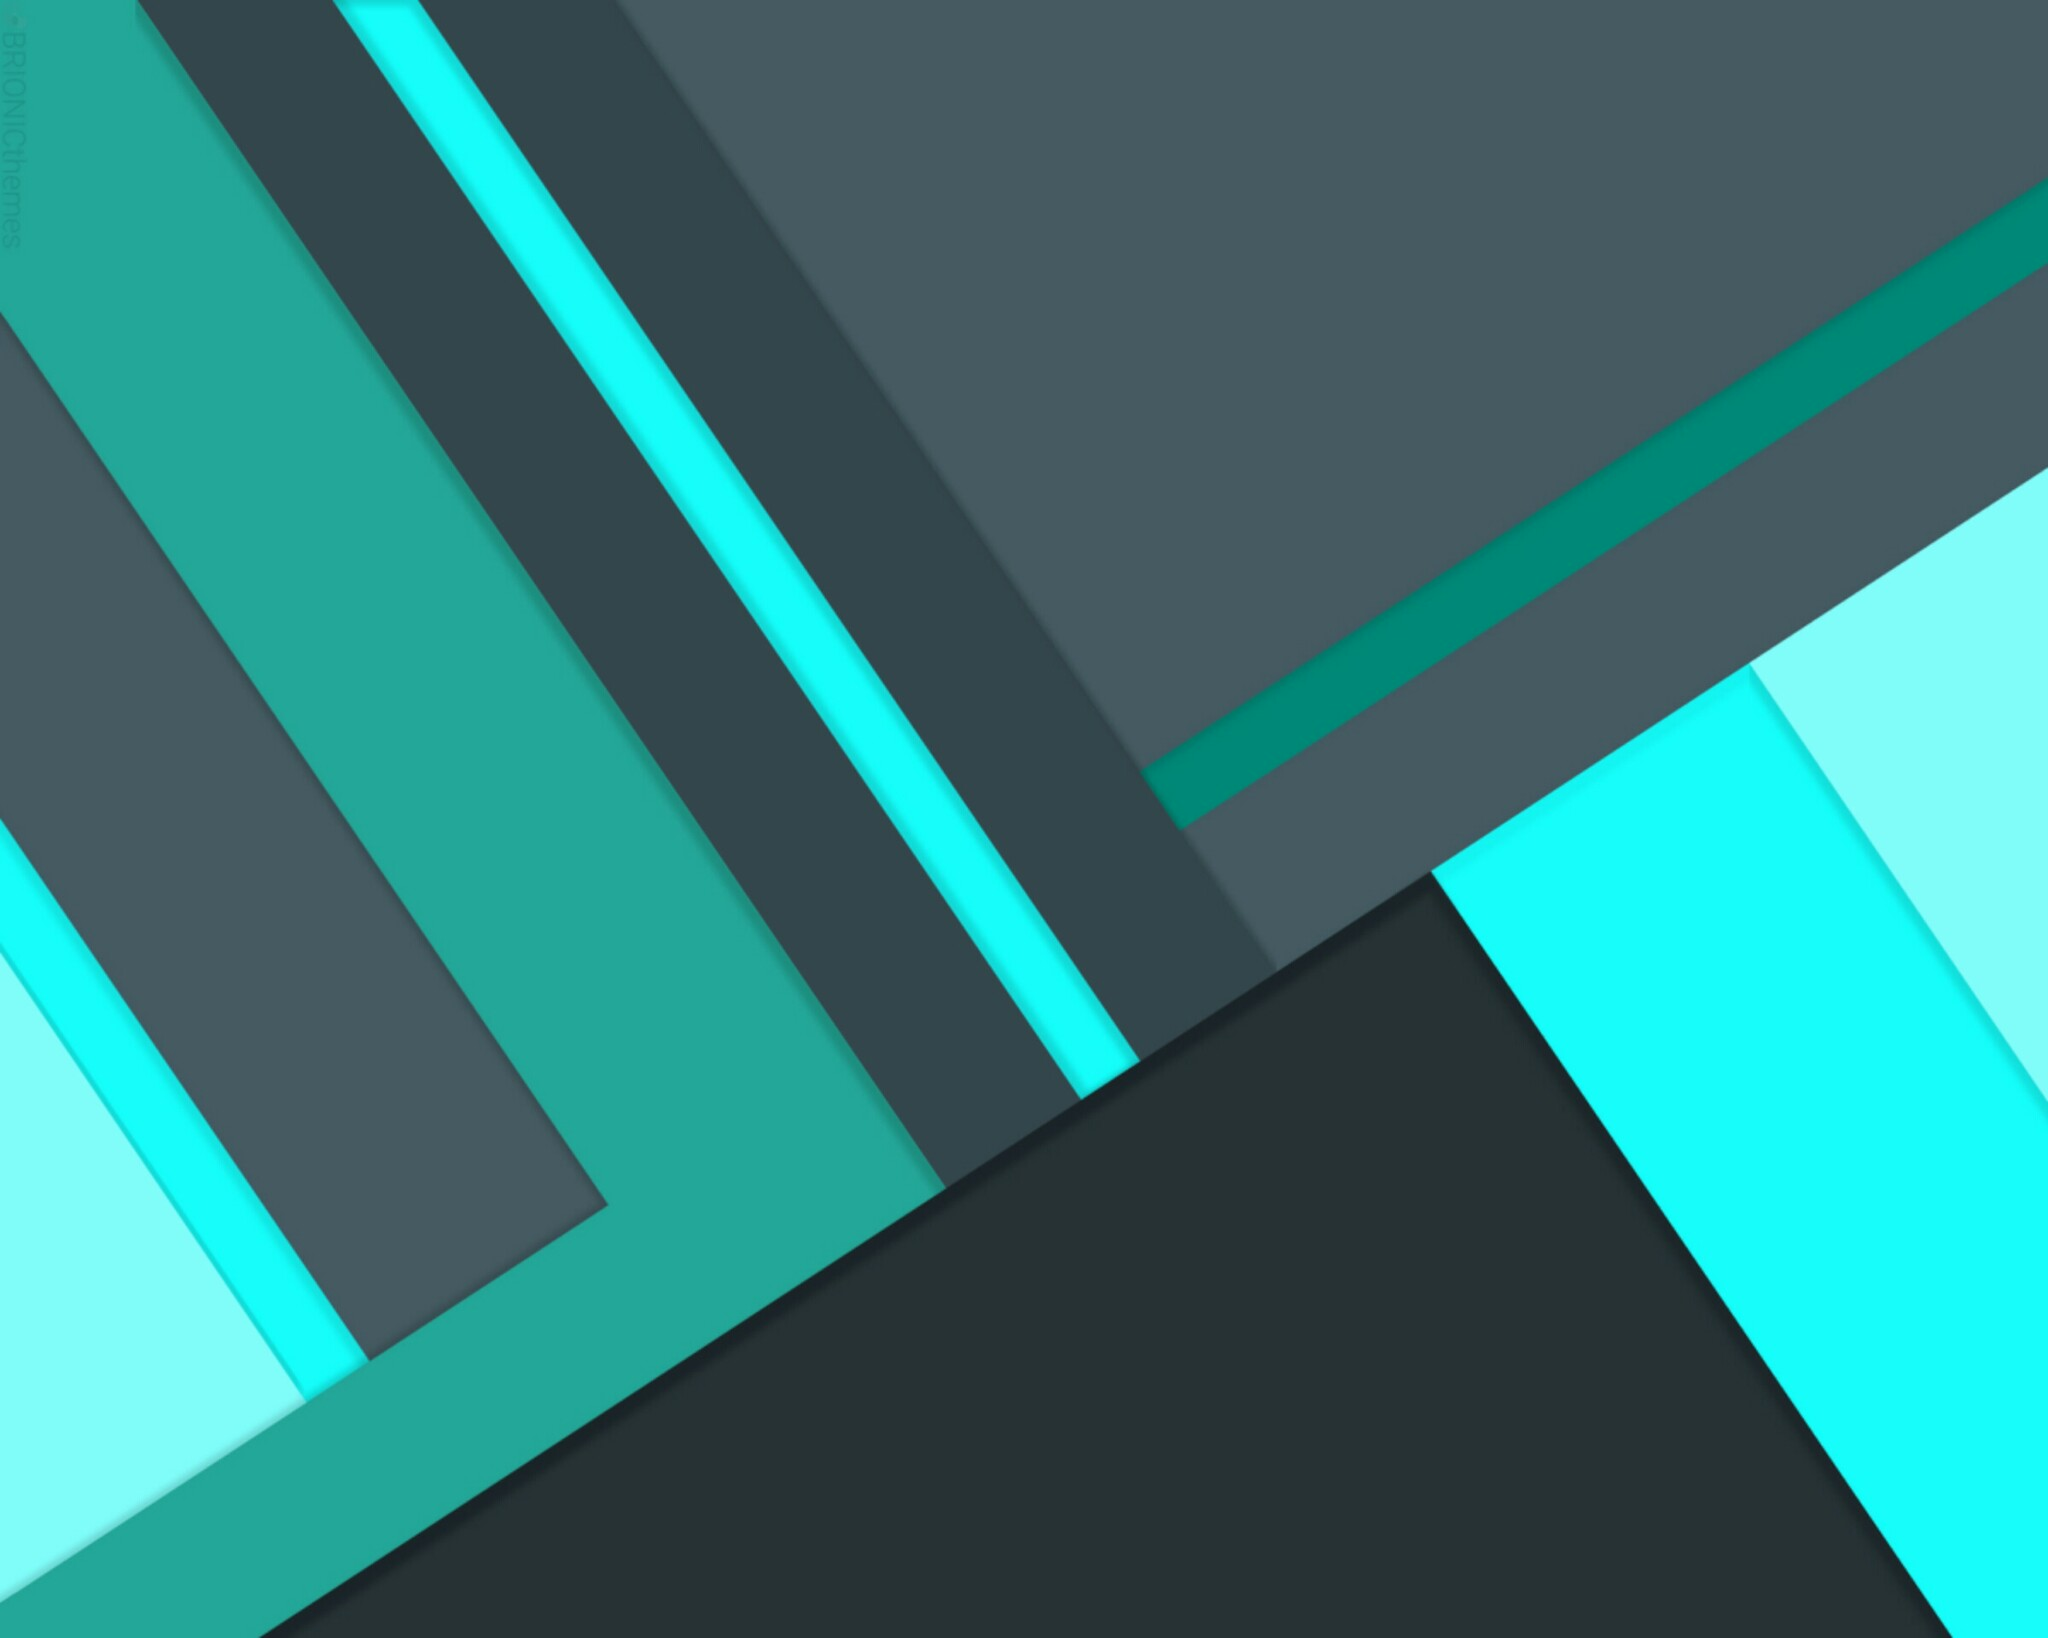 Material Wallpapers Hd: Mes Meilleurs Wallpapers En Full HD